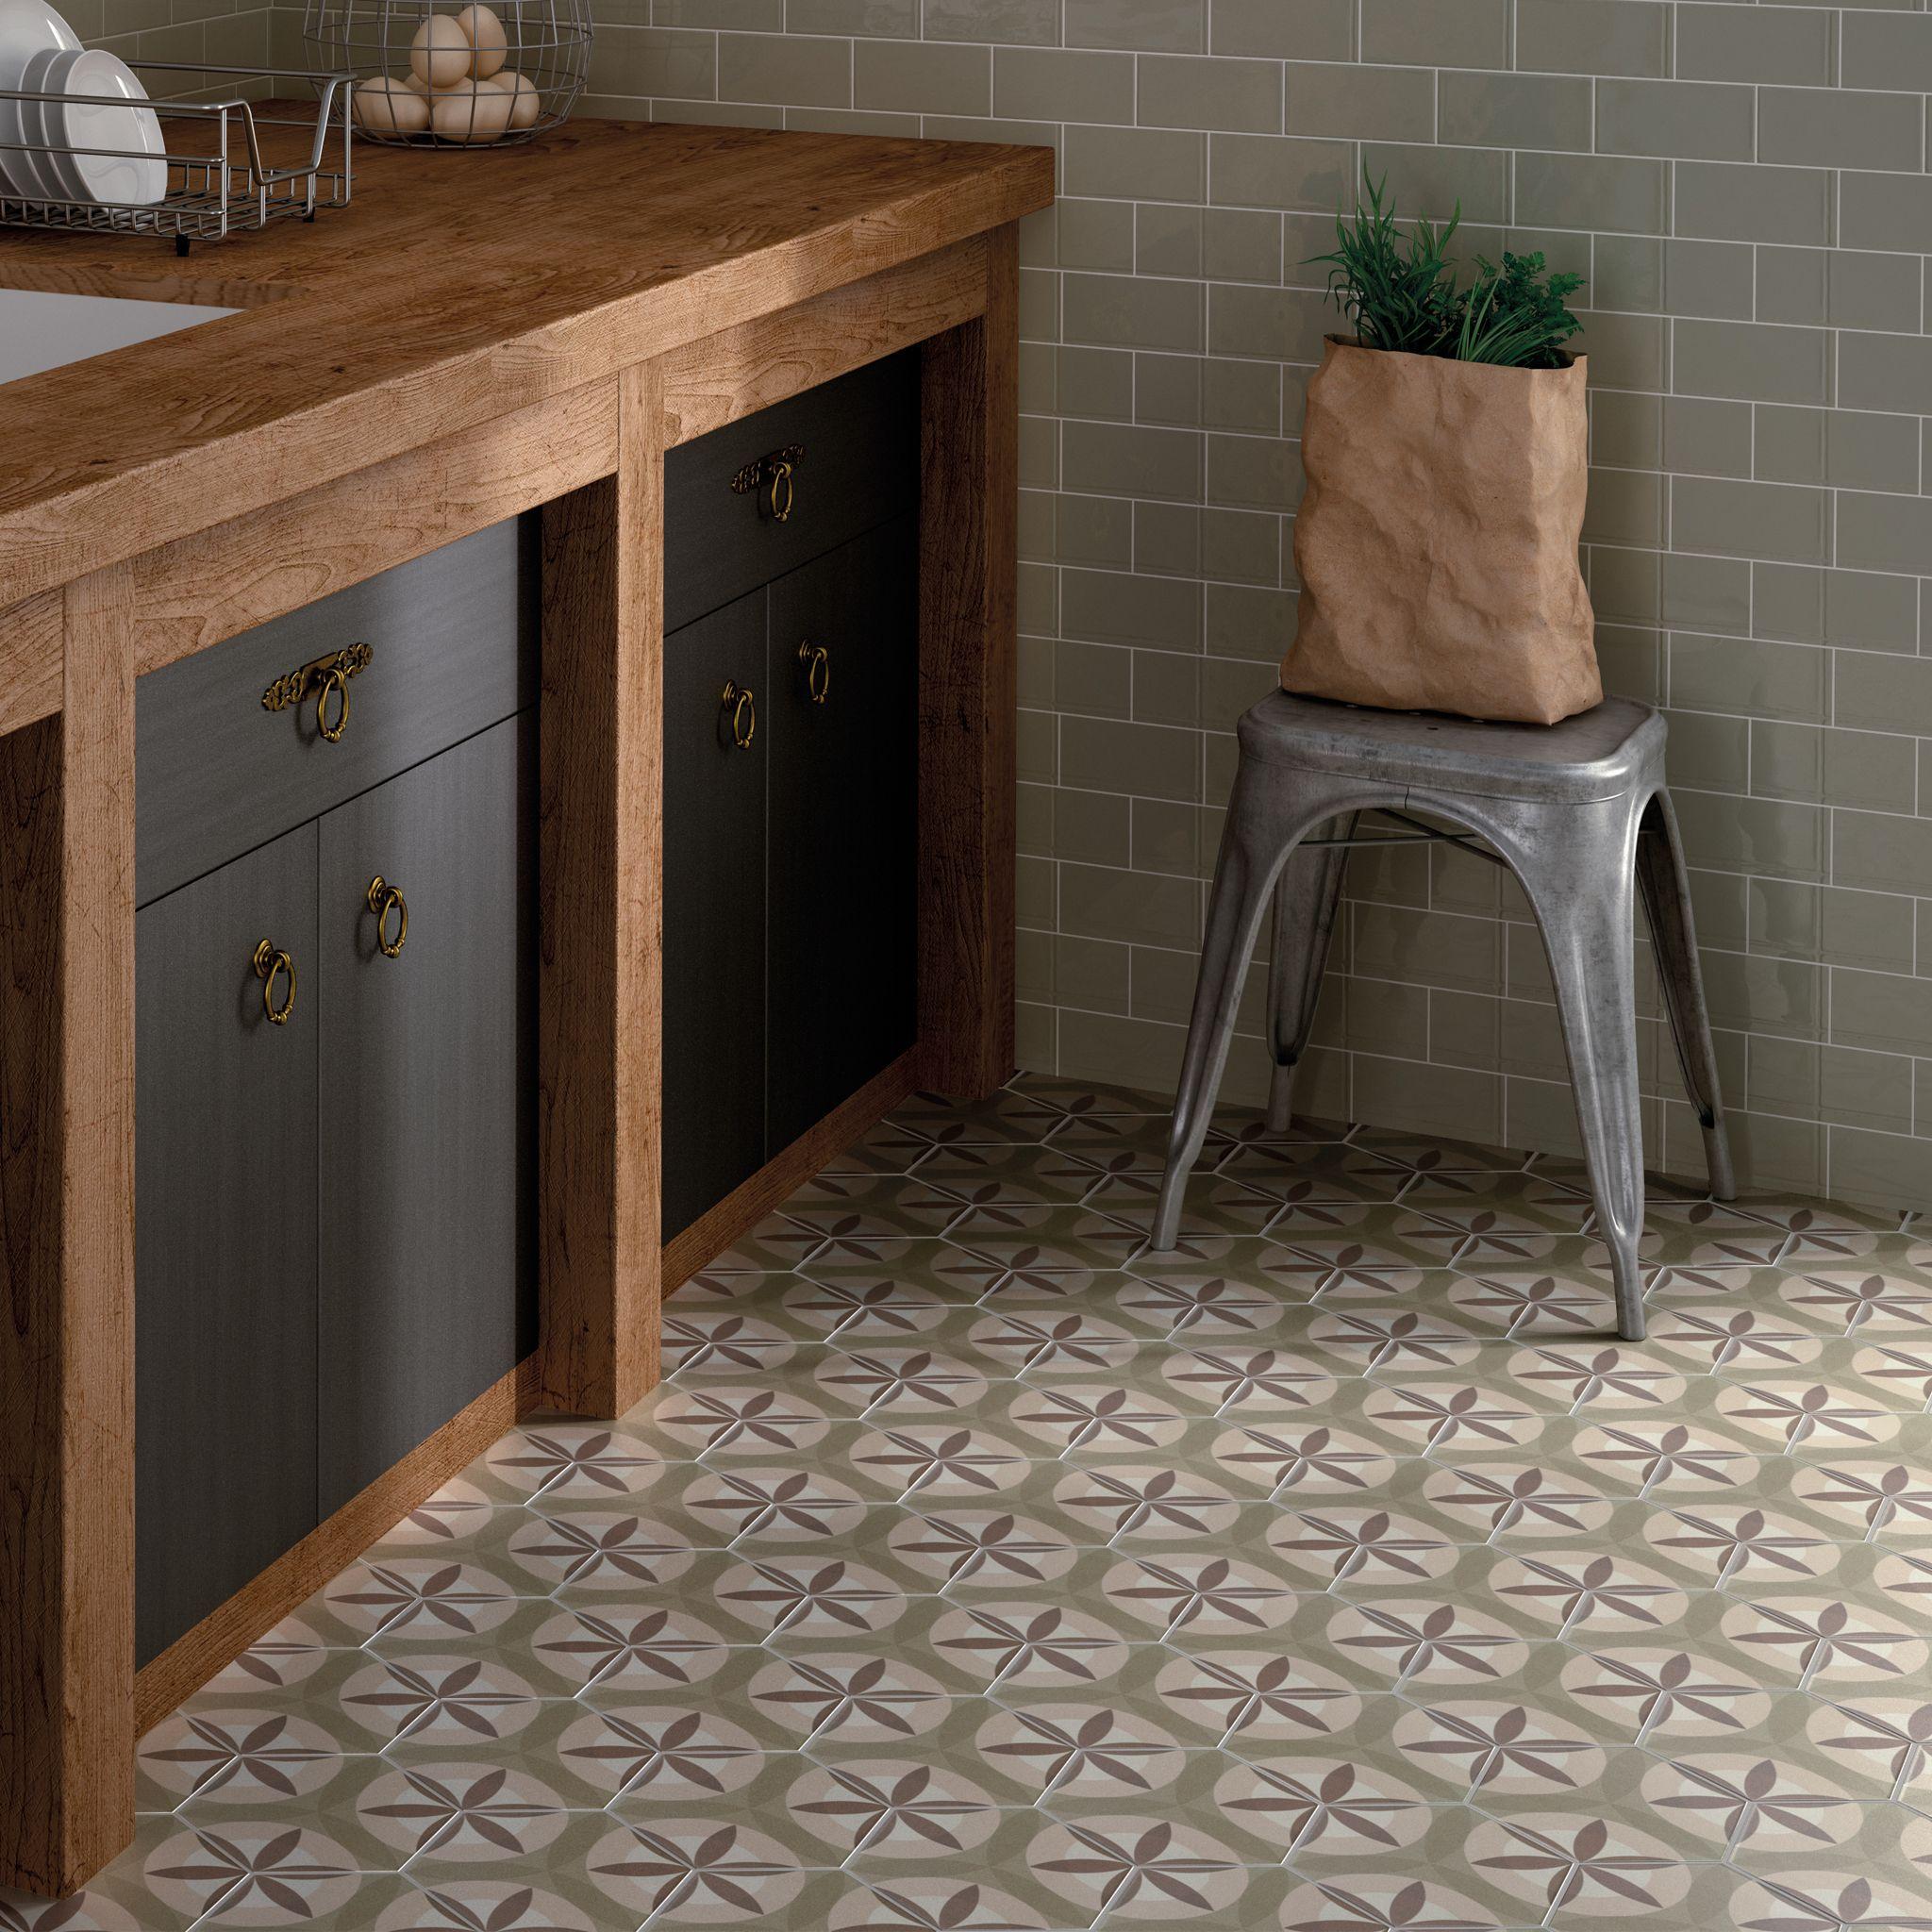 Cream Floor Tiles For Kitchen Hexagon Leaf Cream Pattern Reto Tiles Used As Kitchen Floor Tiles